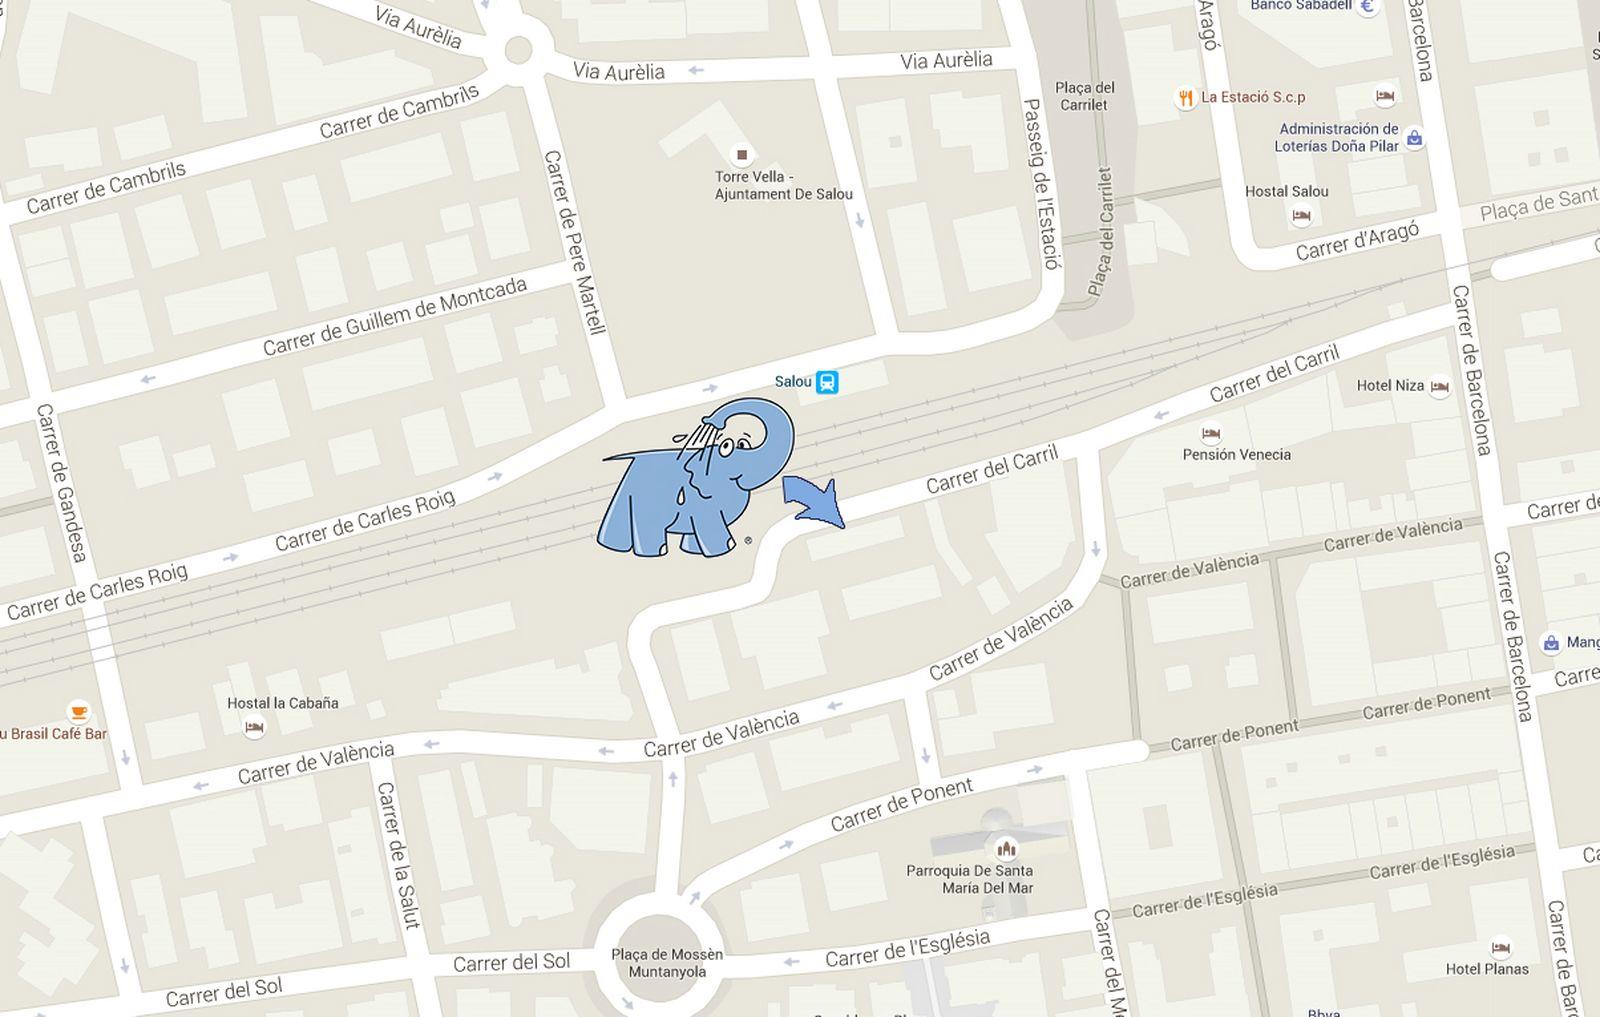 Mapa centro de lavado de coches Elefante Azul SALOU